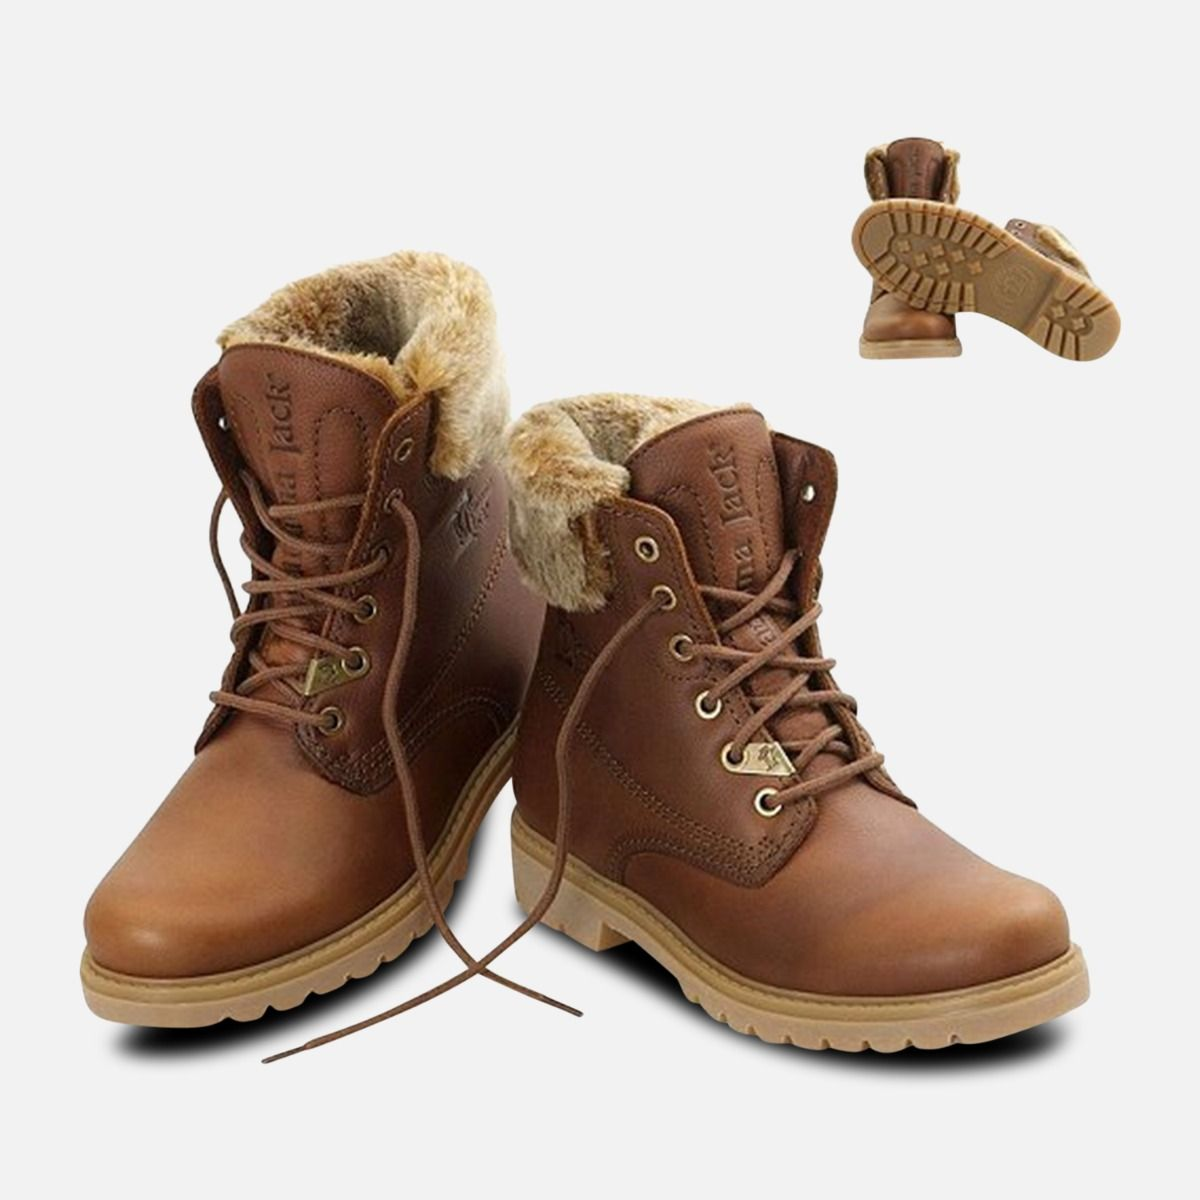 Panama Jack Ladies Havana Joe Fur Collar Boots in Brown Leather